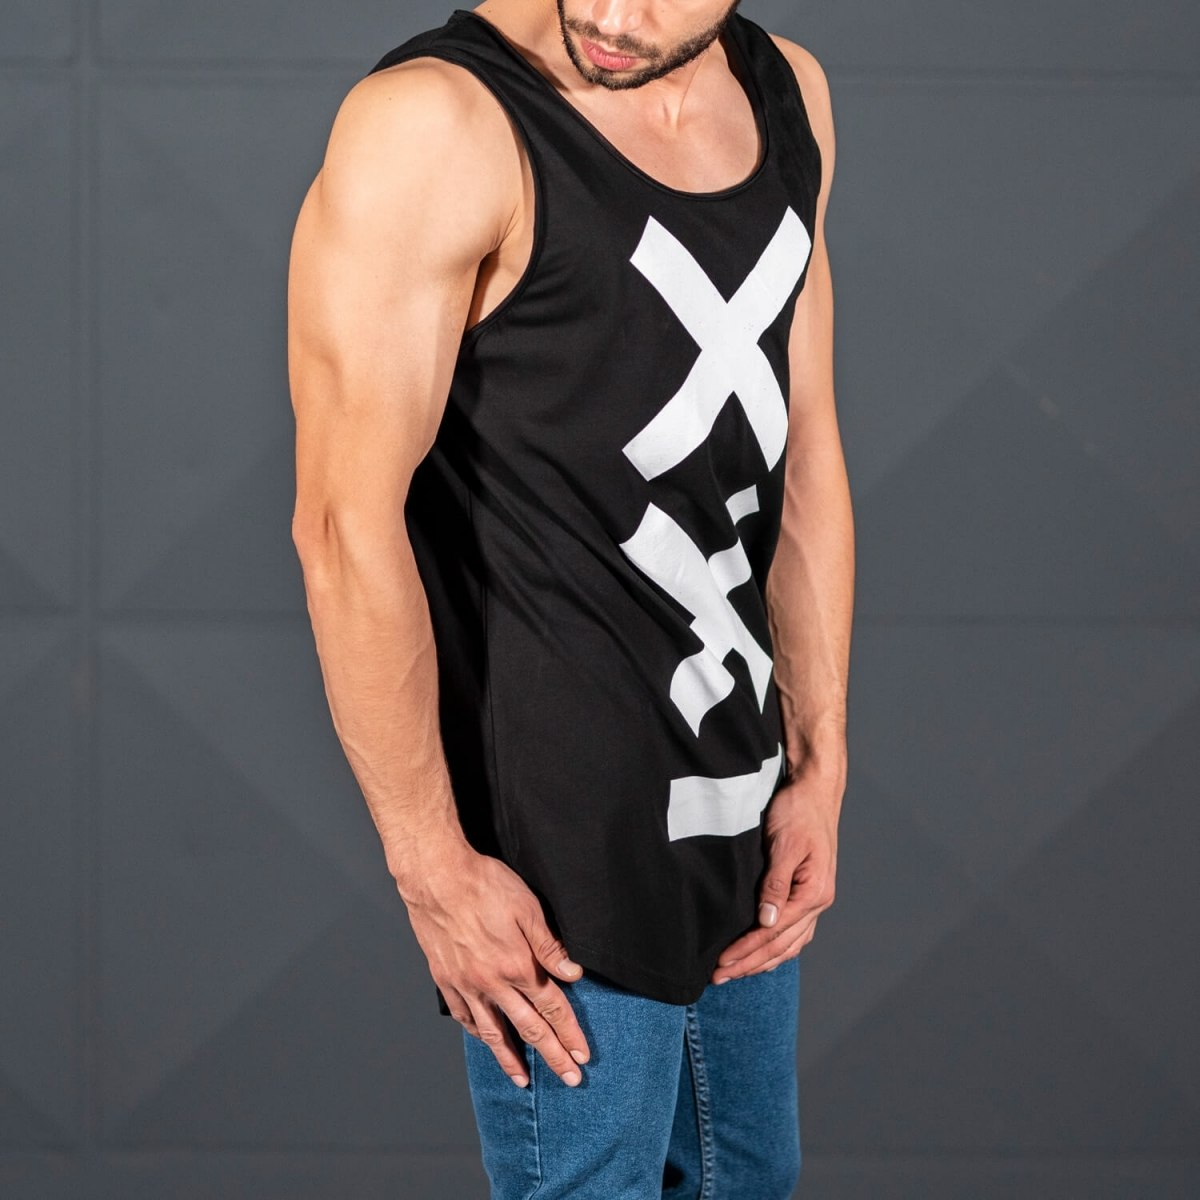 Men's Athletic Sleeveless XX Tall Tank Top Black Mv Premium Brand - 3